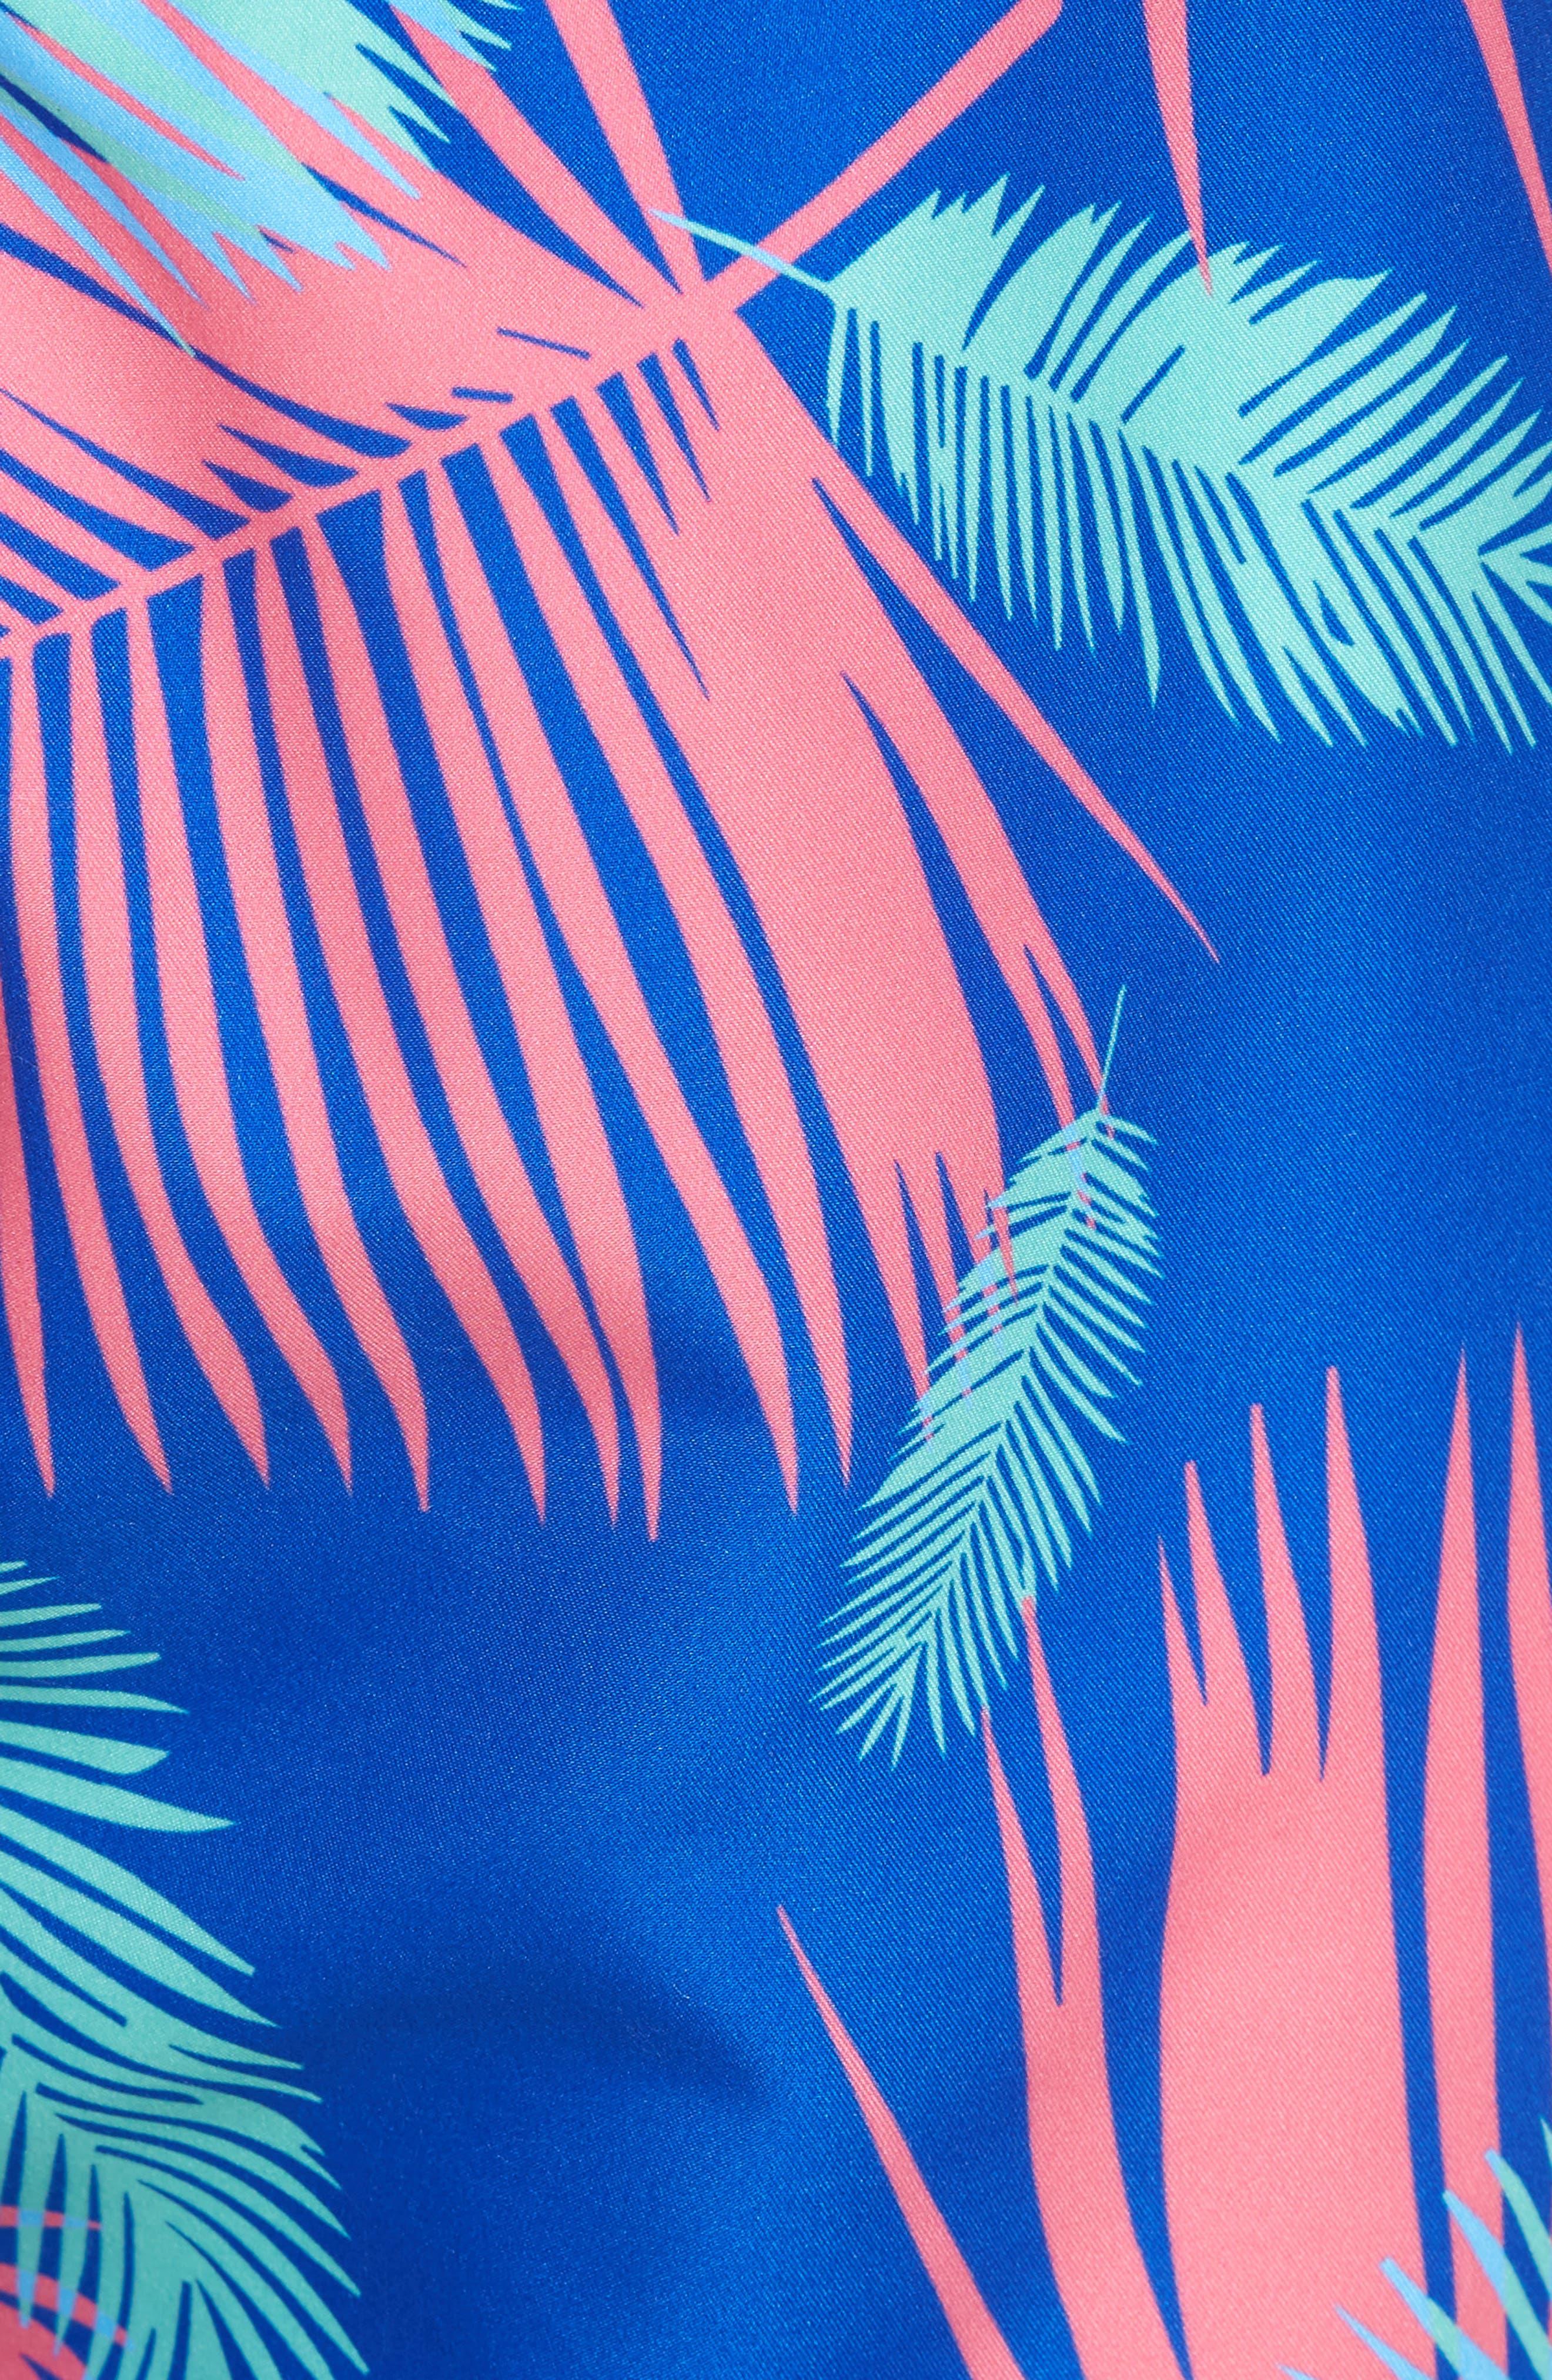 Tropicano Swim Trunks,                             Alternate thumbnail 5, color,                             Multi